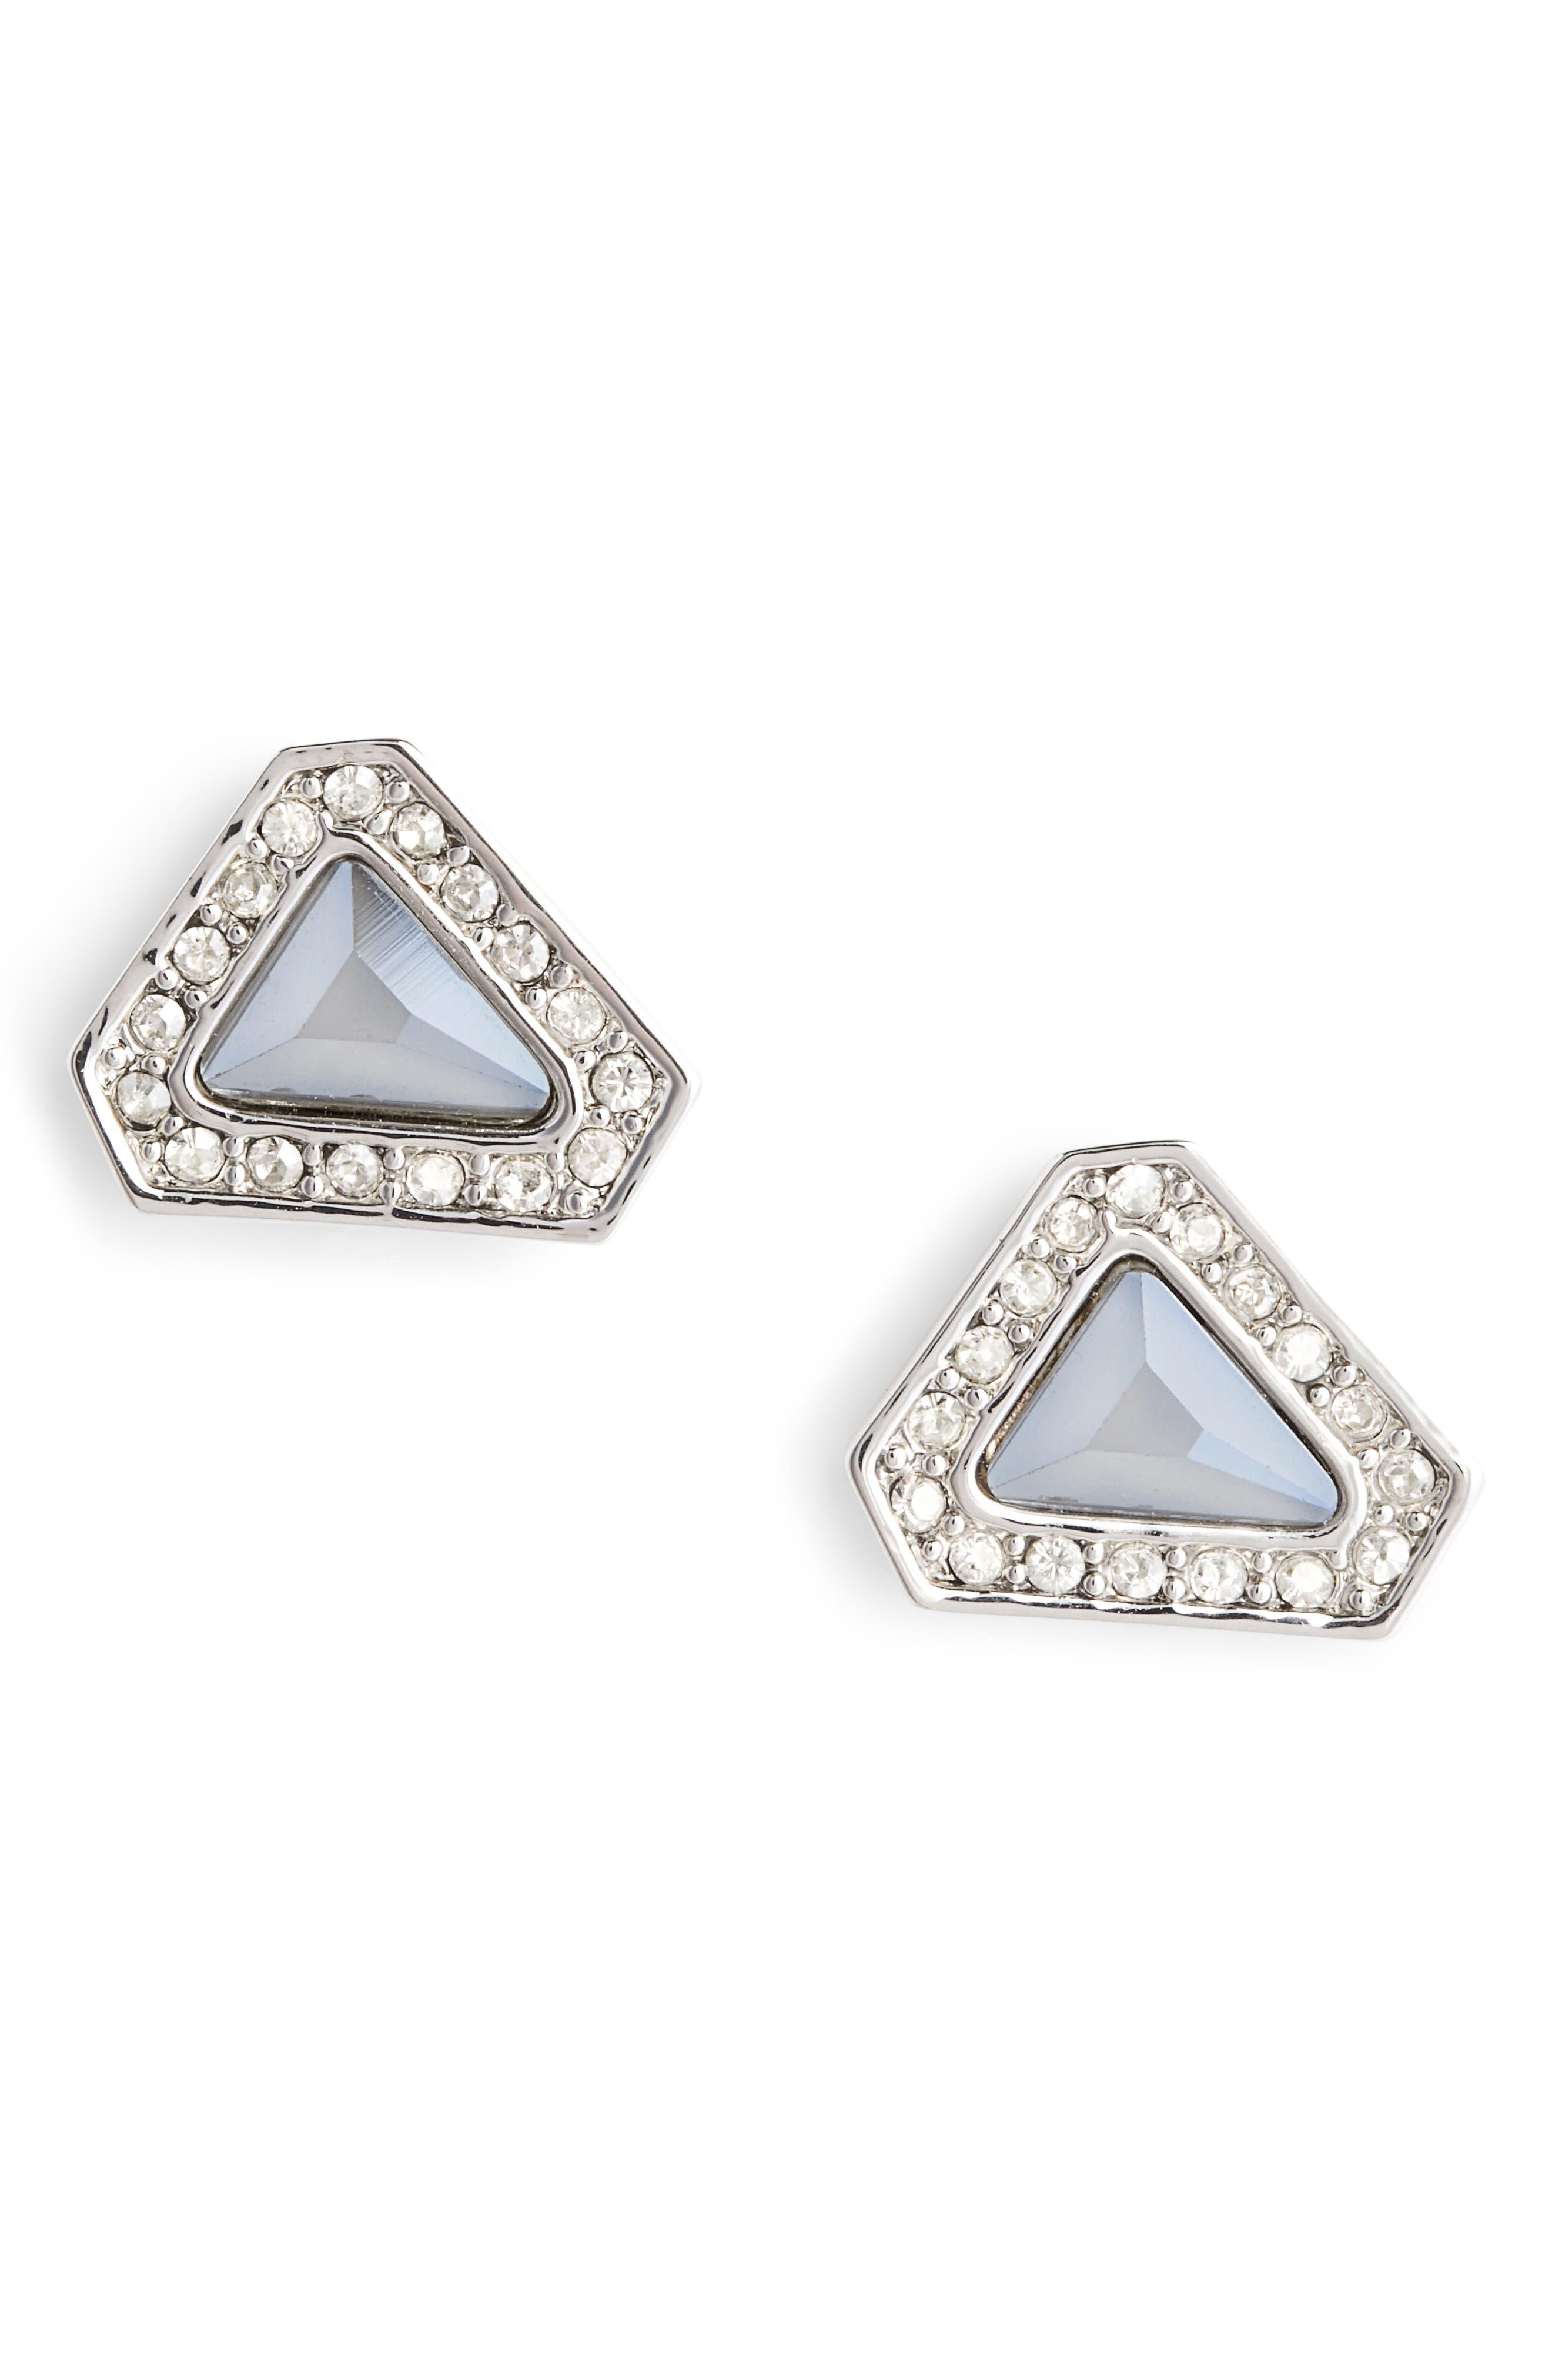 Alternate Image 1 Selected - St. John Collection Swarovski Crystal Stud Earrings